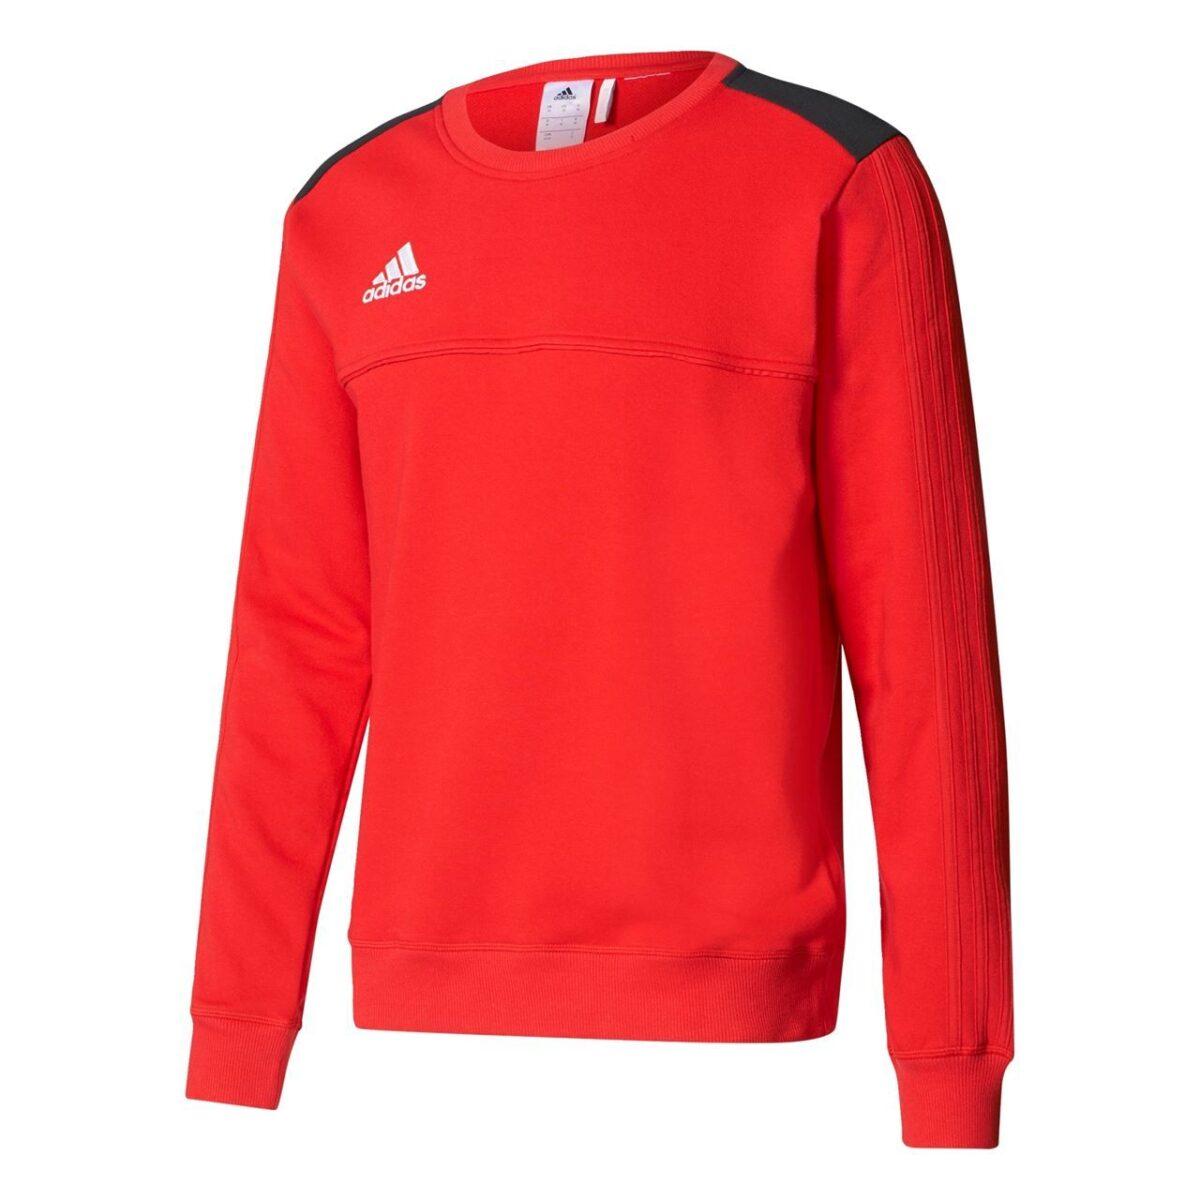 Adidas Tiro 17 Sweat Top BQ2671 Red/Black